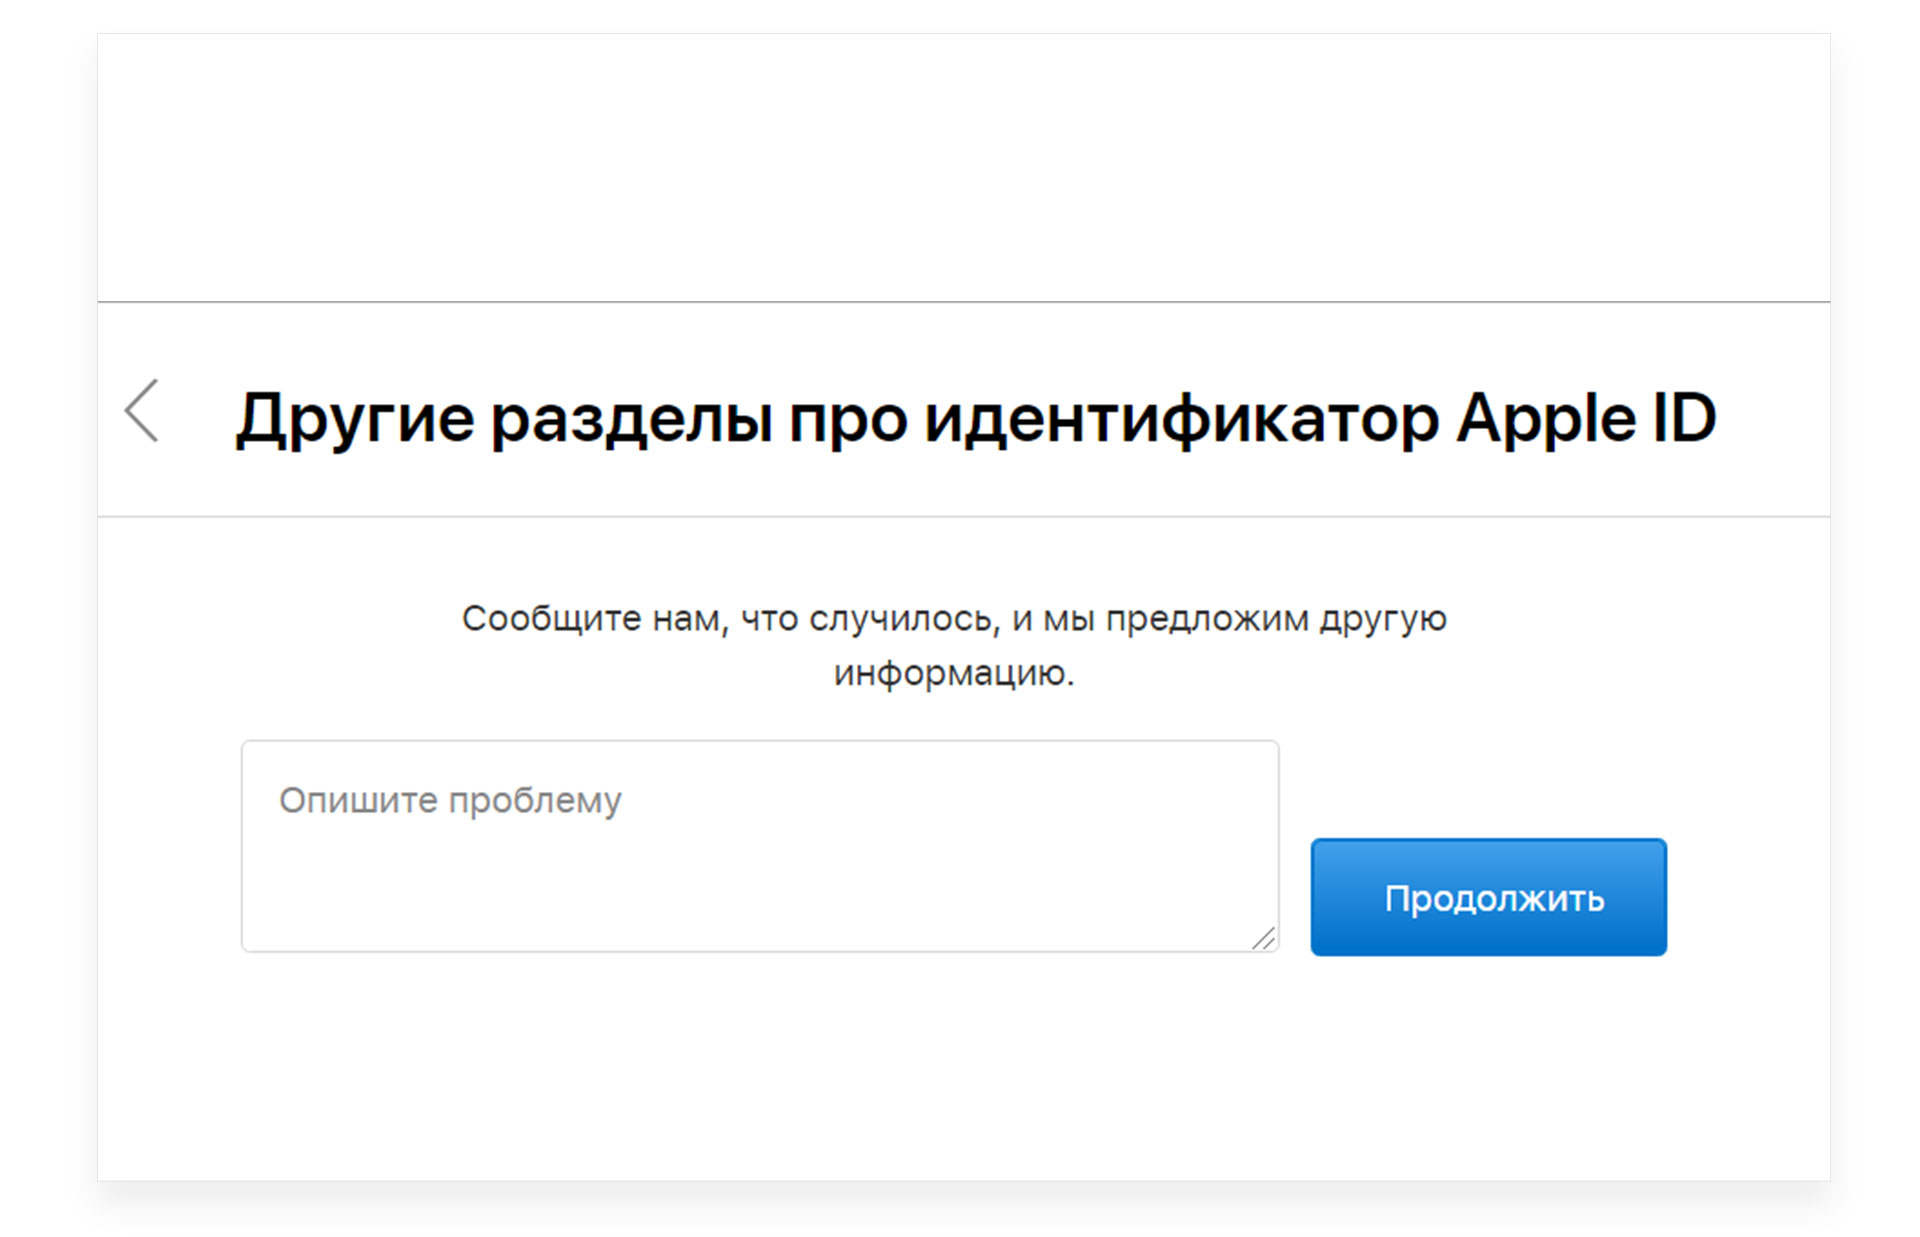 Восстанавливаем логин apple id через службу поддержки